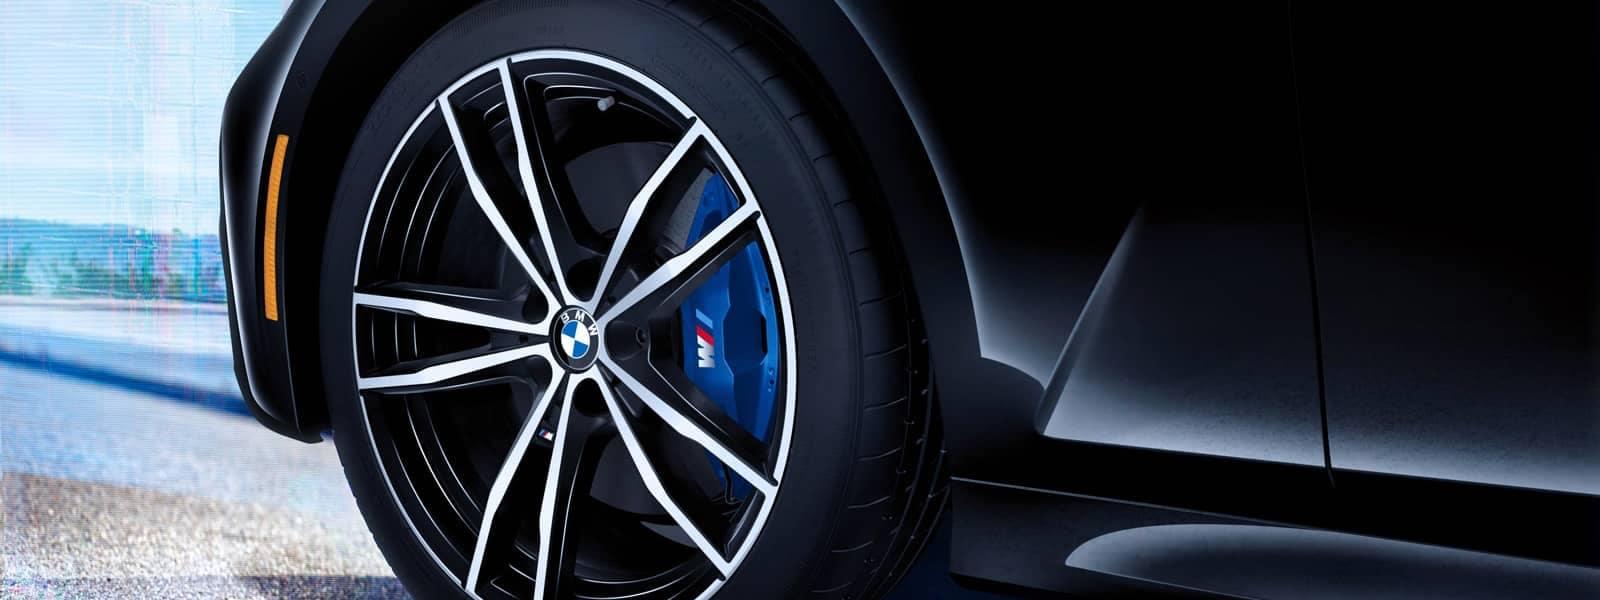 2020 BMW M3 brake caliper